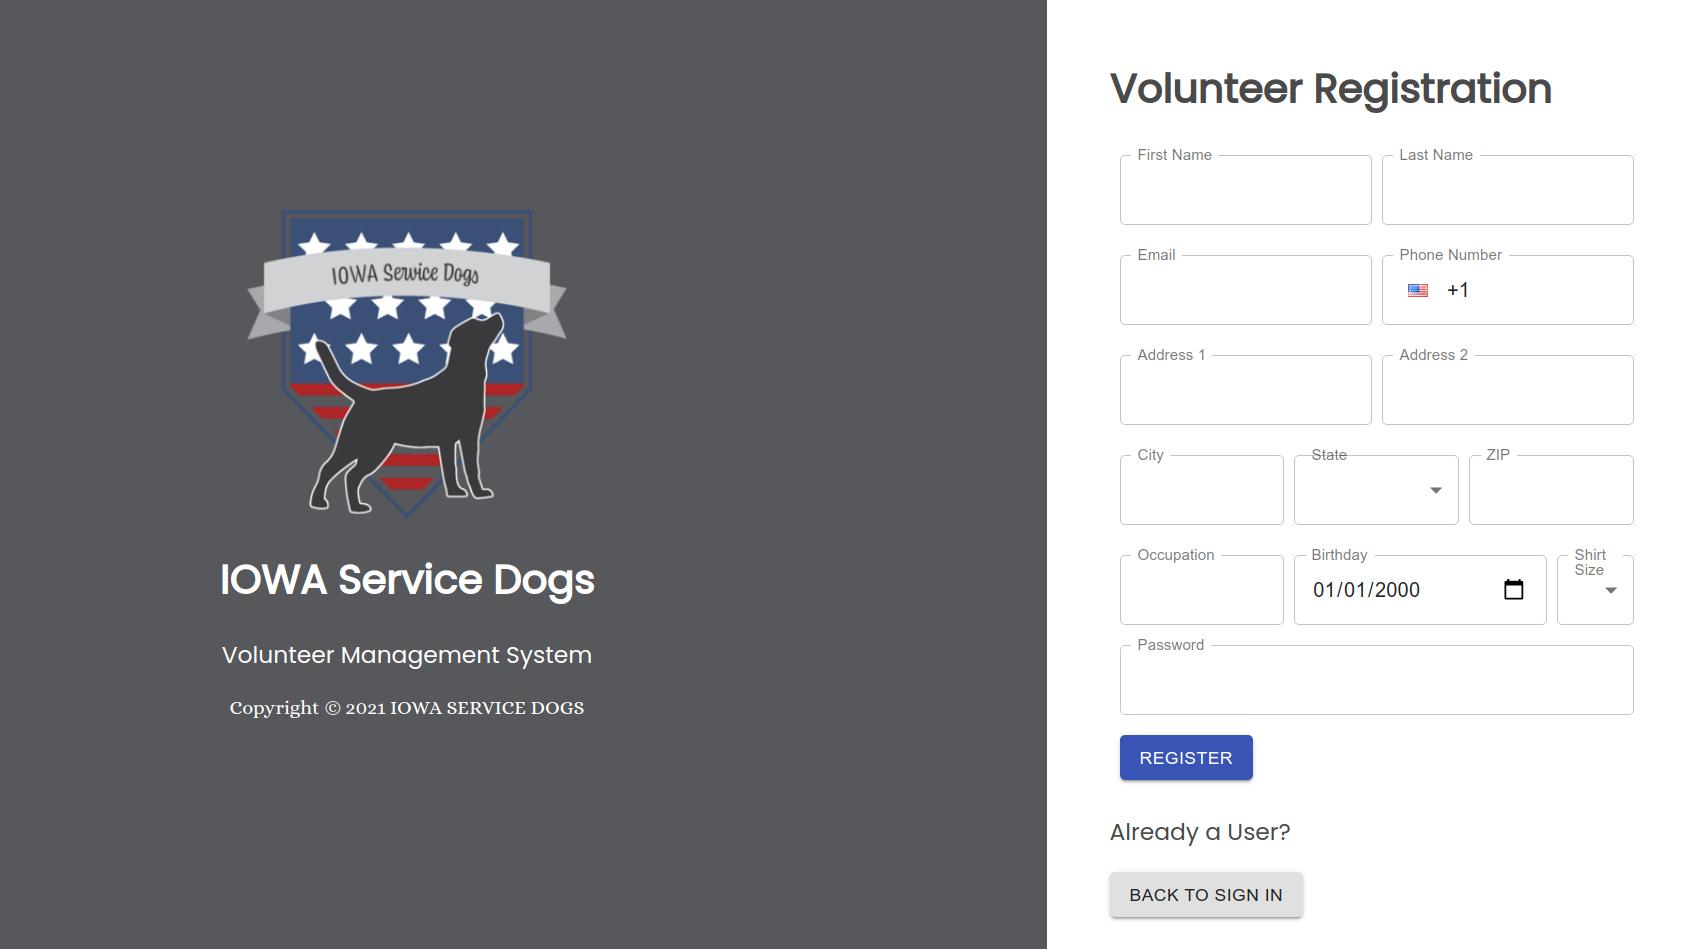 A screenshot of Iowa Service Dog's volunteer management site registration page.